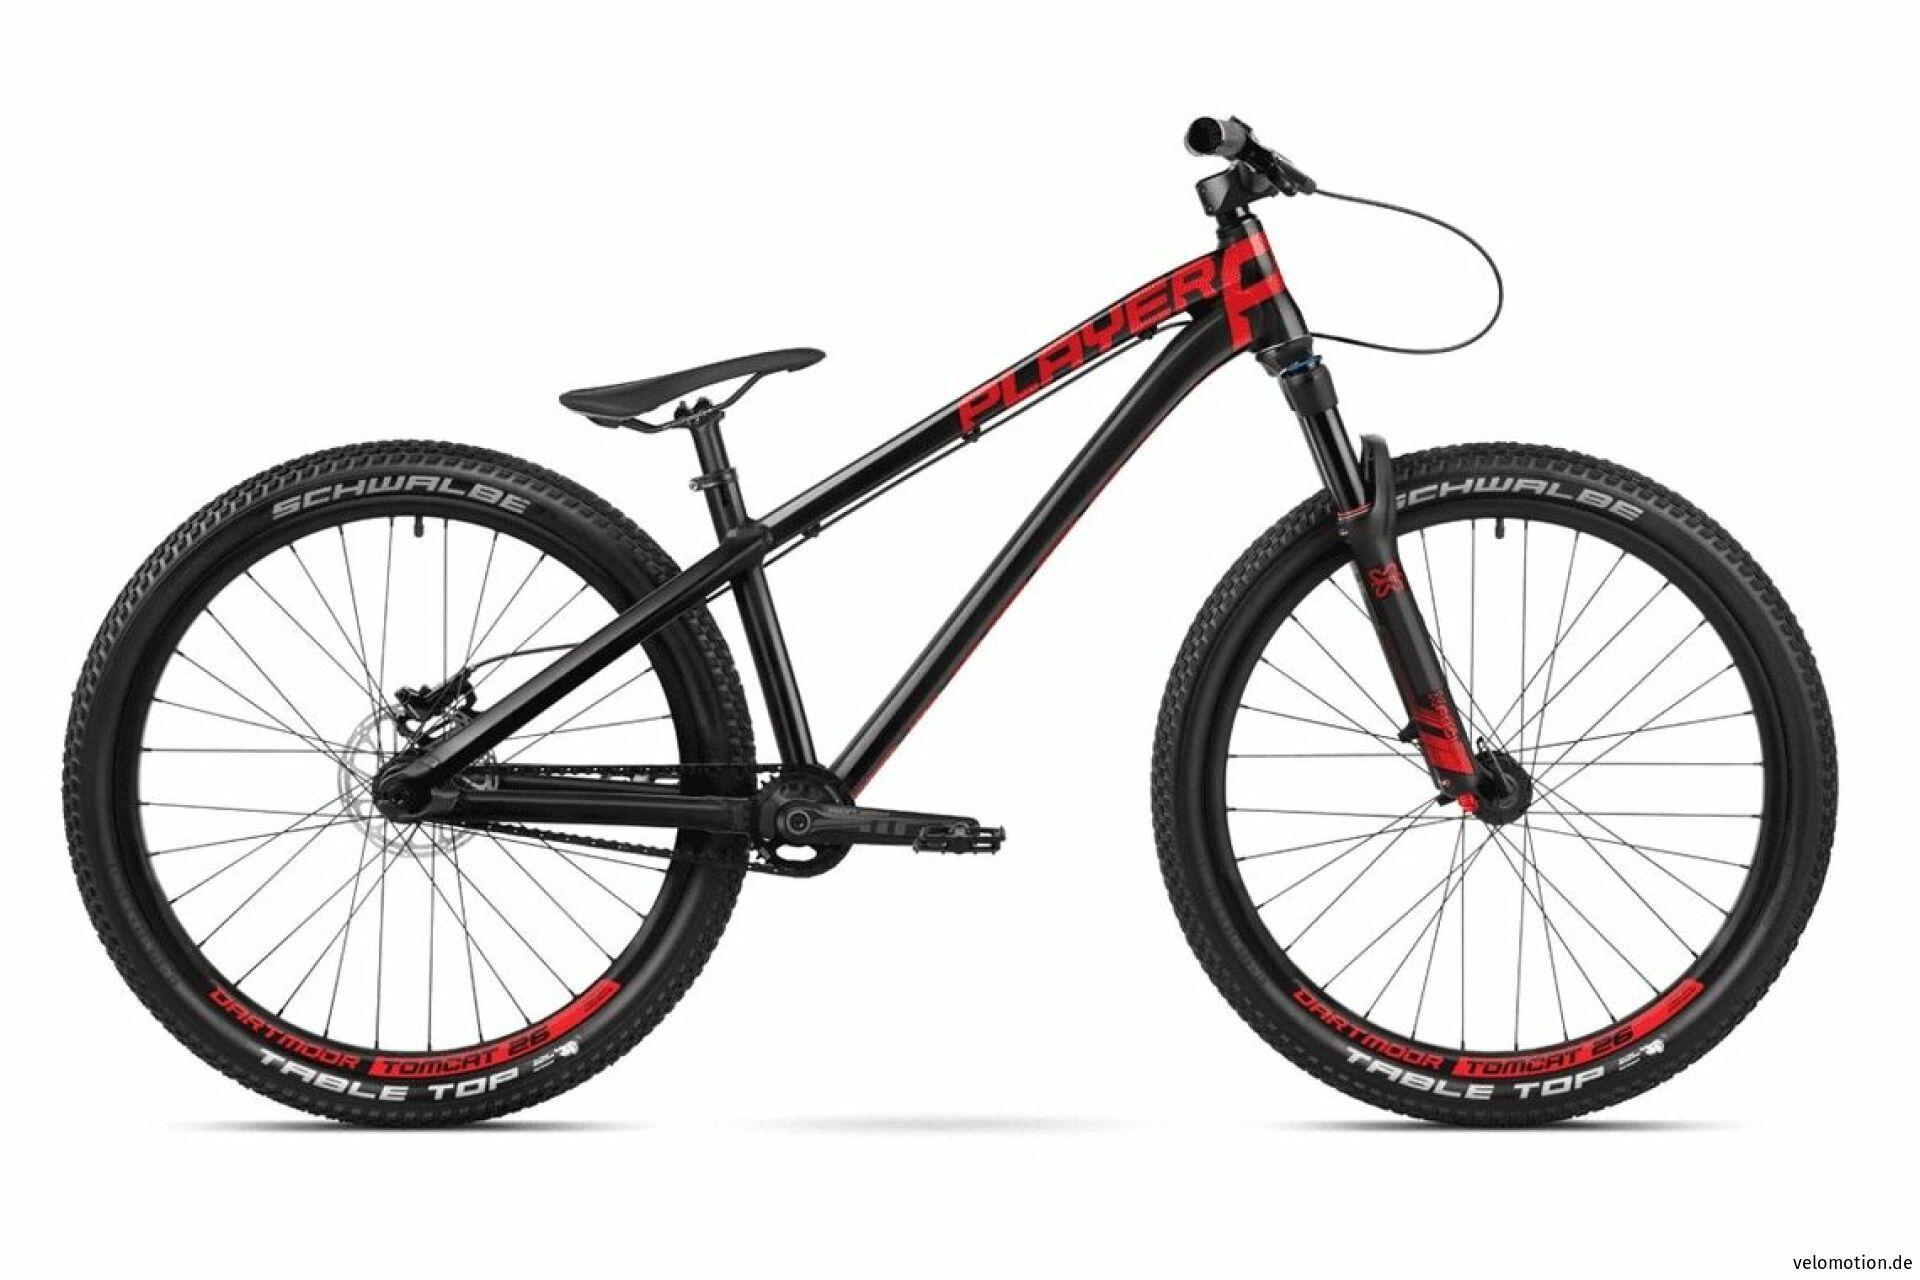 Dirt BikeTwo6Player Pump #1